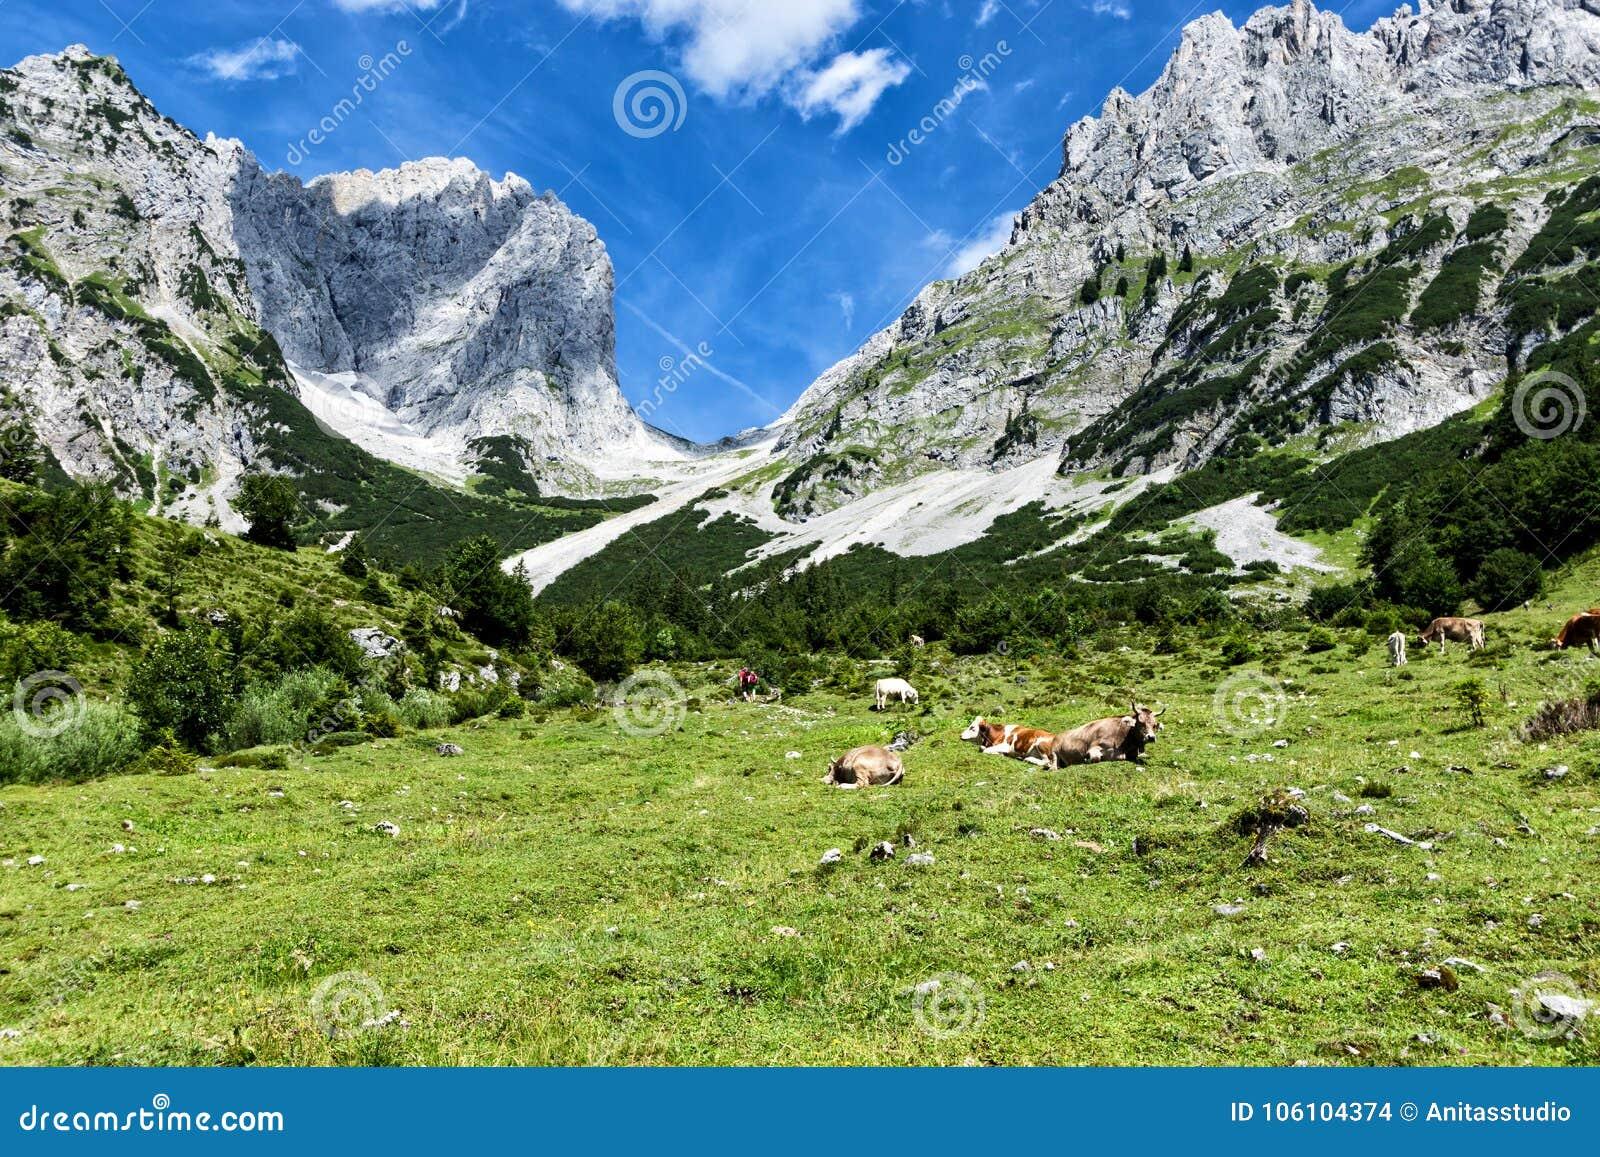 Cows grazing in high alpine pastures in the Alps. Austria, Tiro